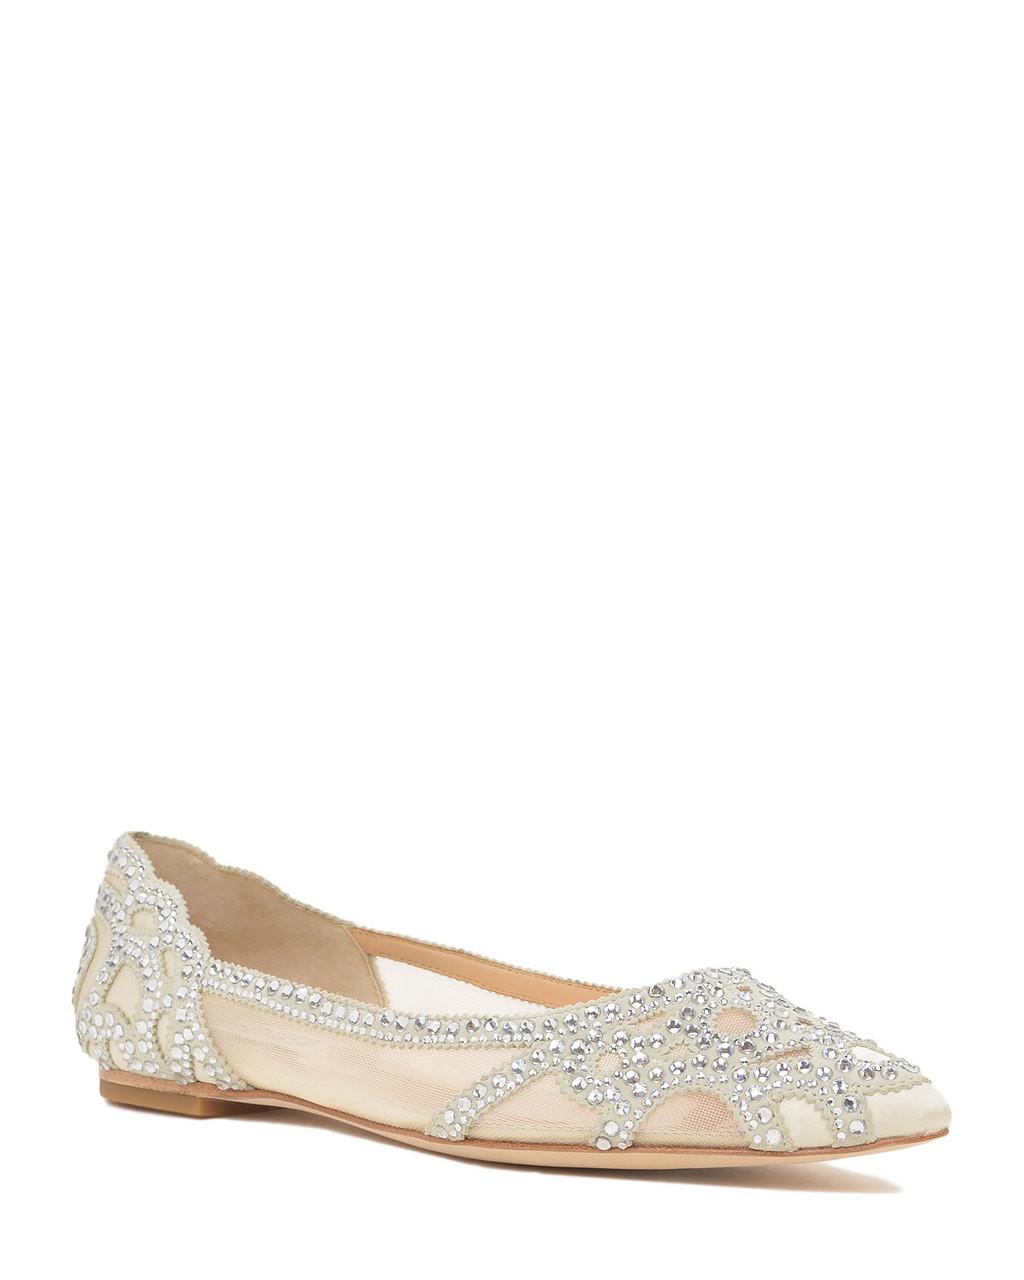 Gigi Pointed Toe Flat Evening Shoe by